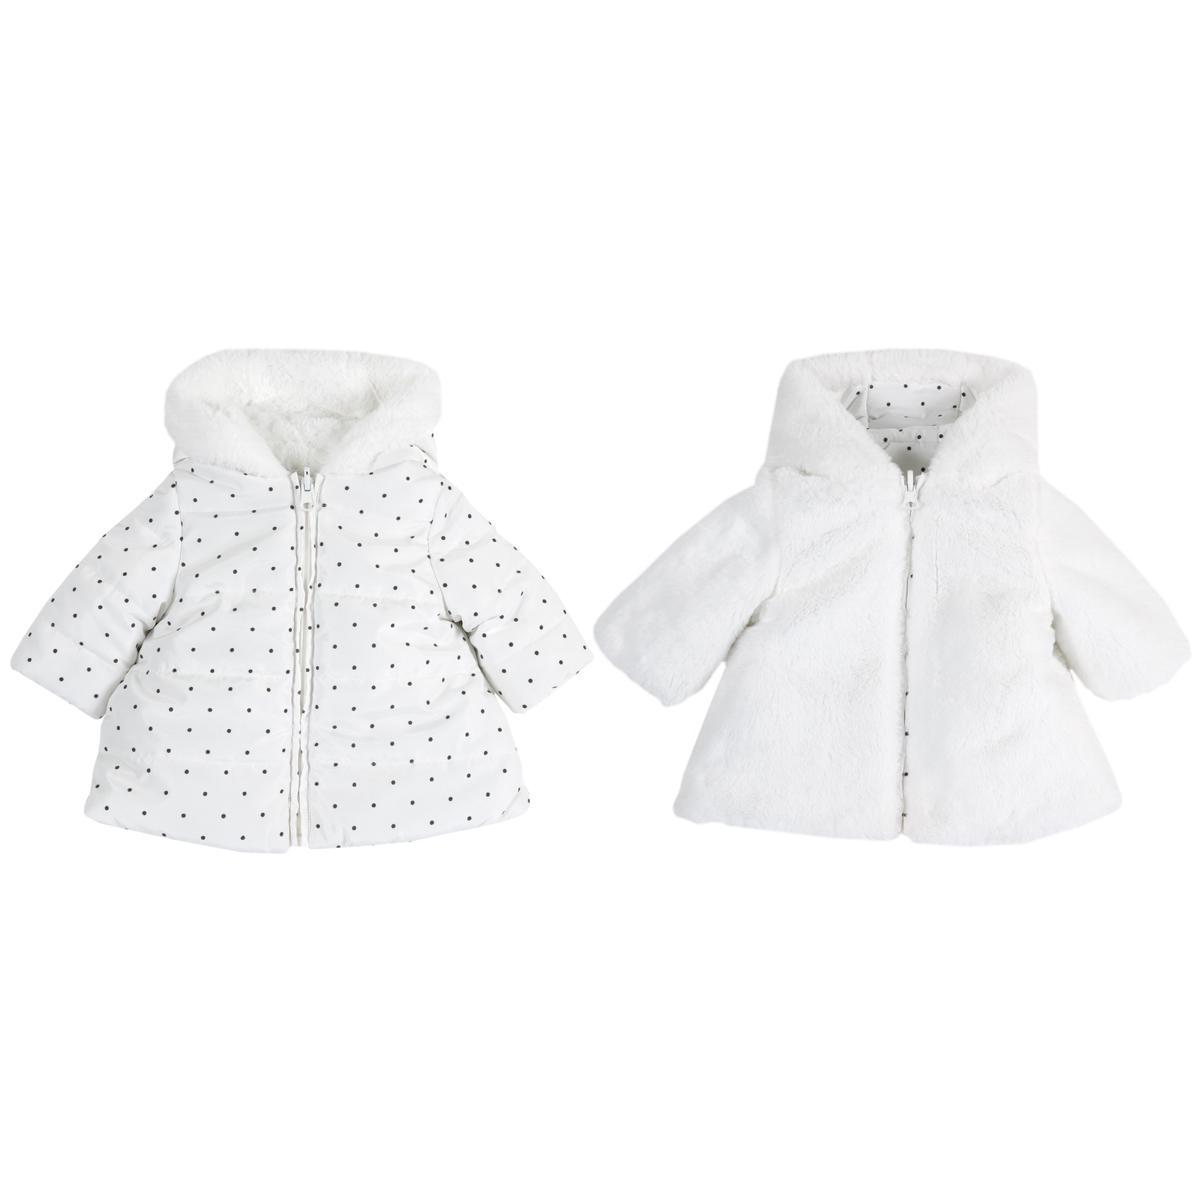 Jacheta copii Chicco, reversibila, blanita artificiala, alb, 87407 din categoria Jachete copii